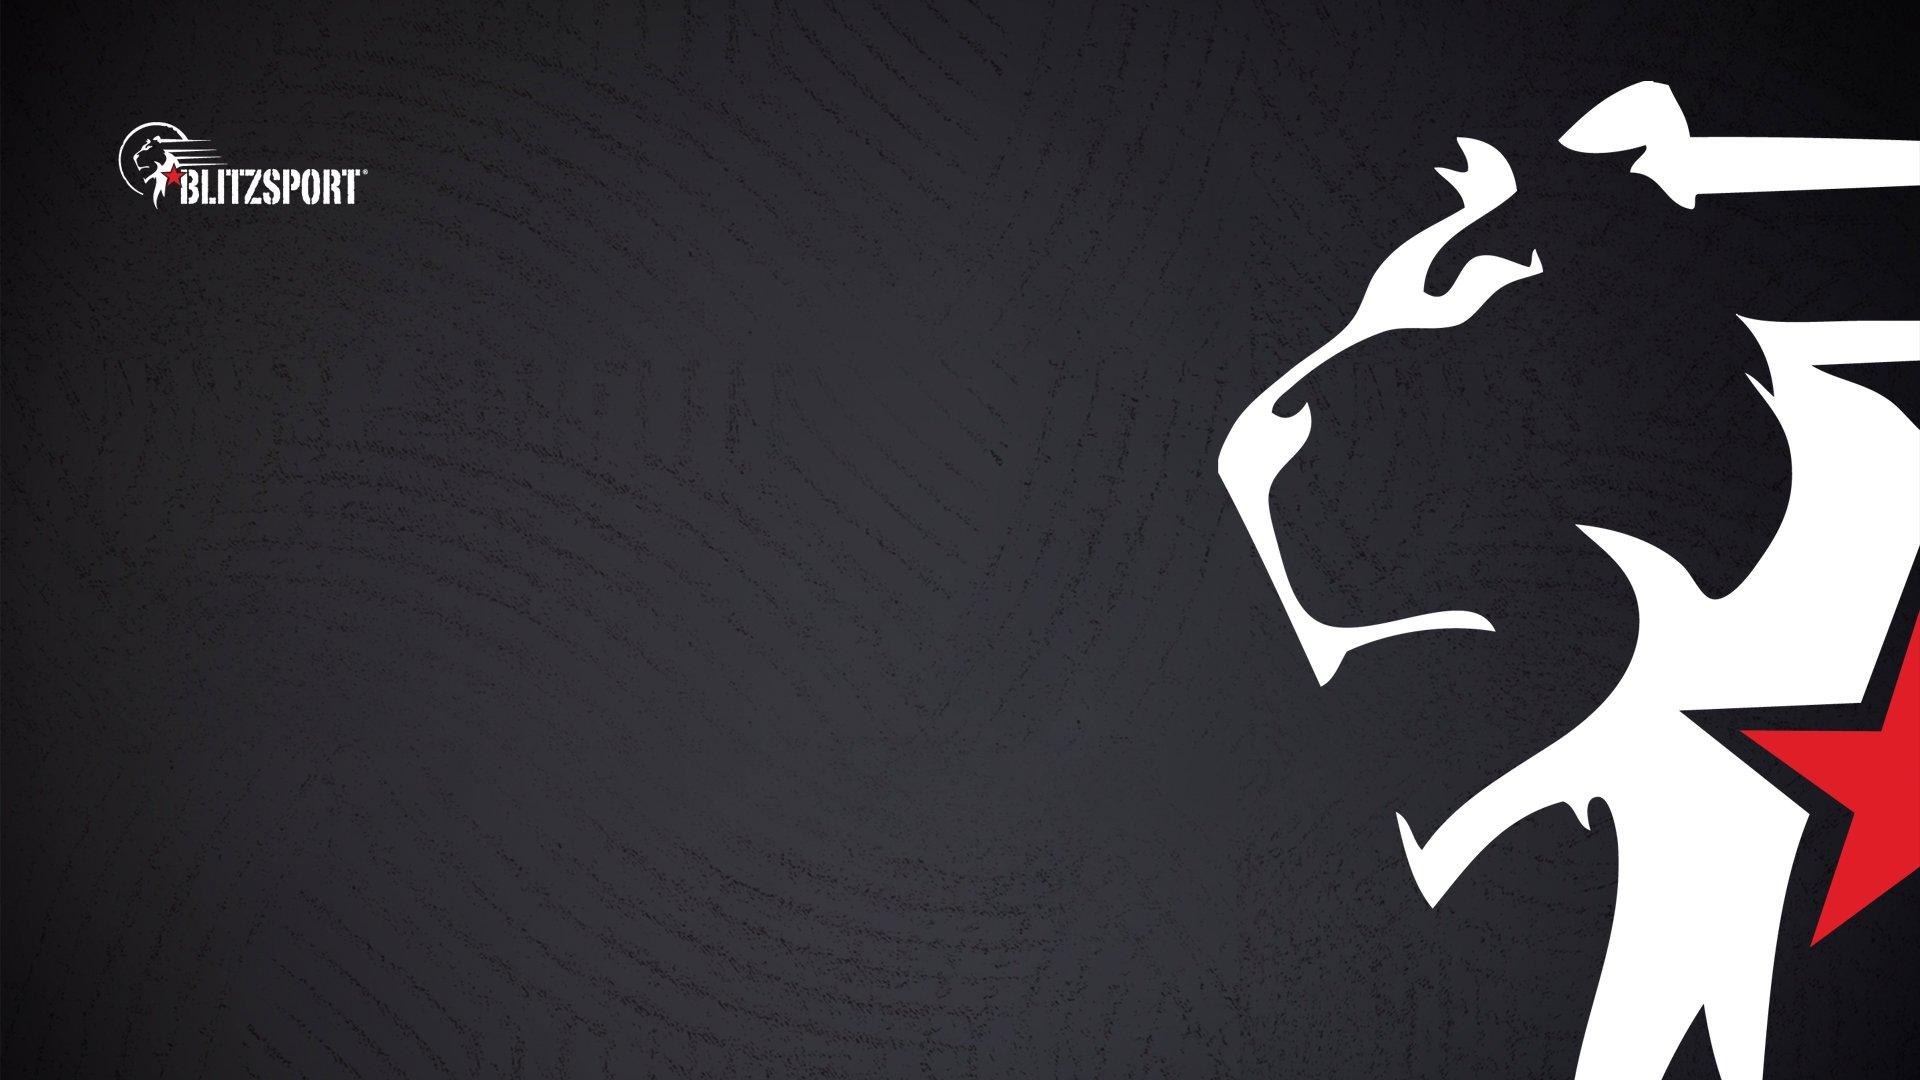 [72+] Sports Logo Wallpaper On WallpaperSafari